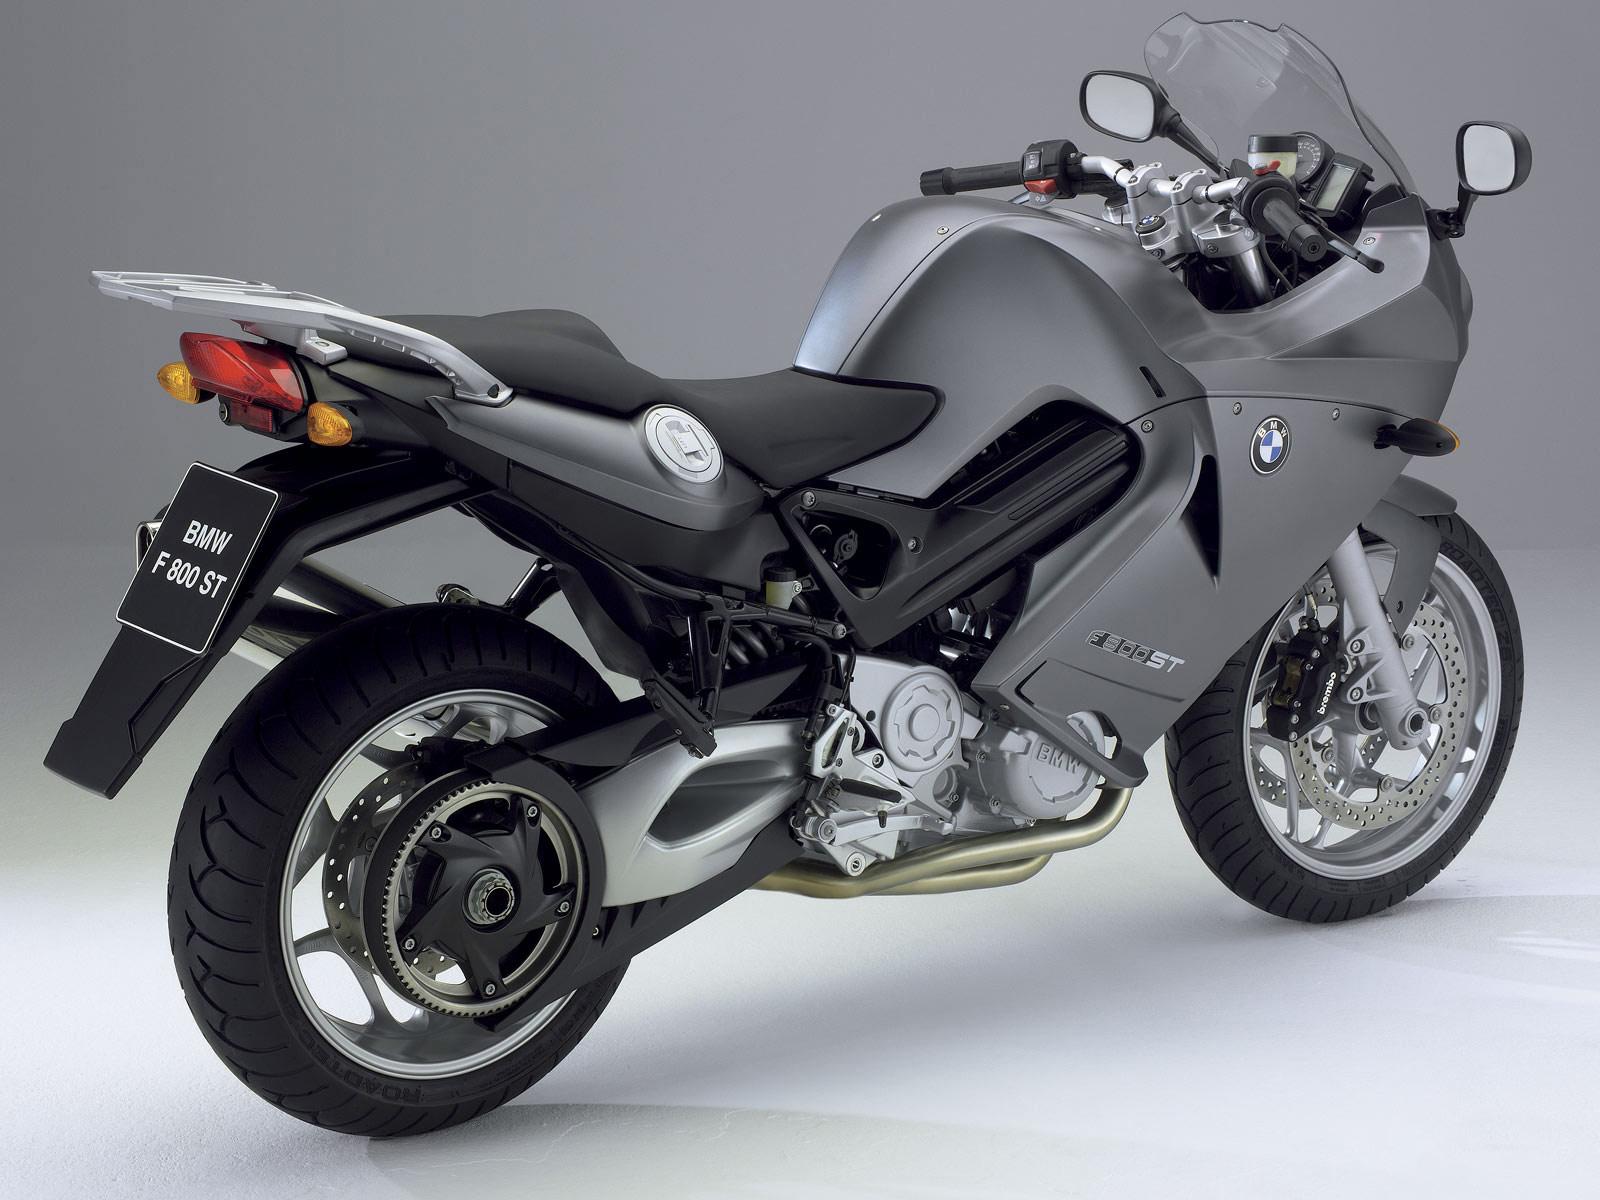 2006 BMW F800 ST Motorcycle Desktop Wallpapers 1600x1200